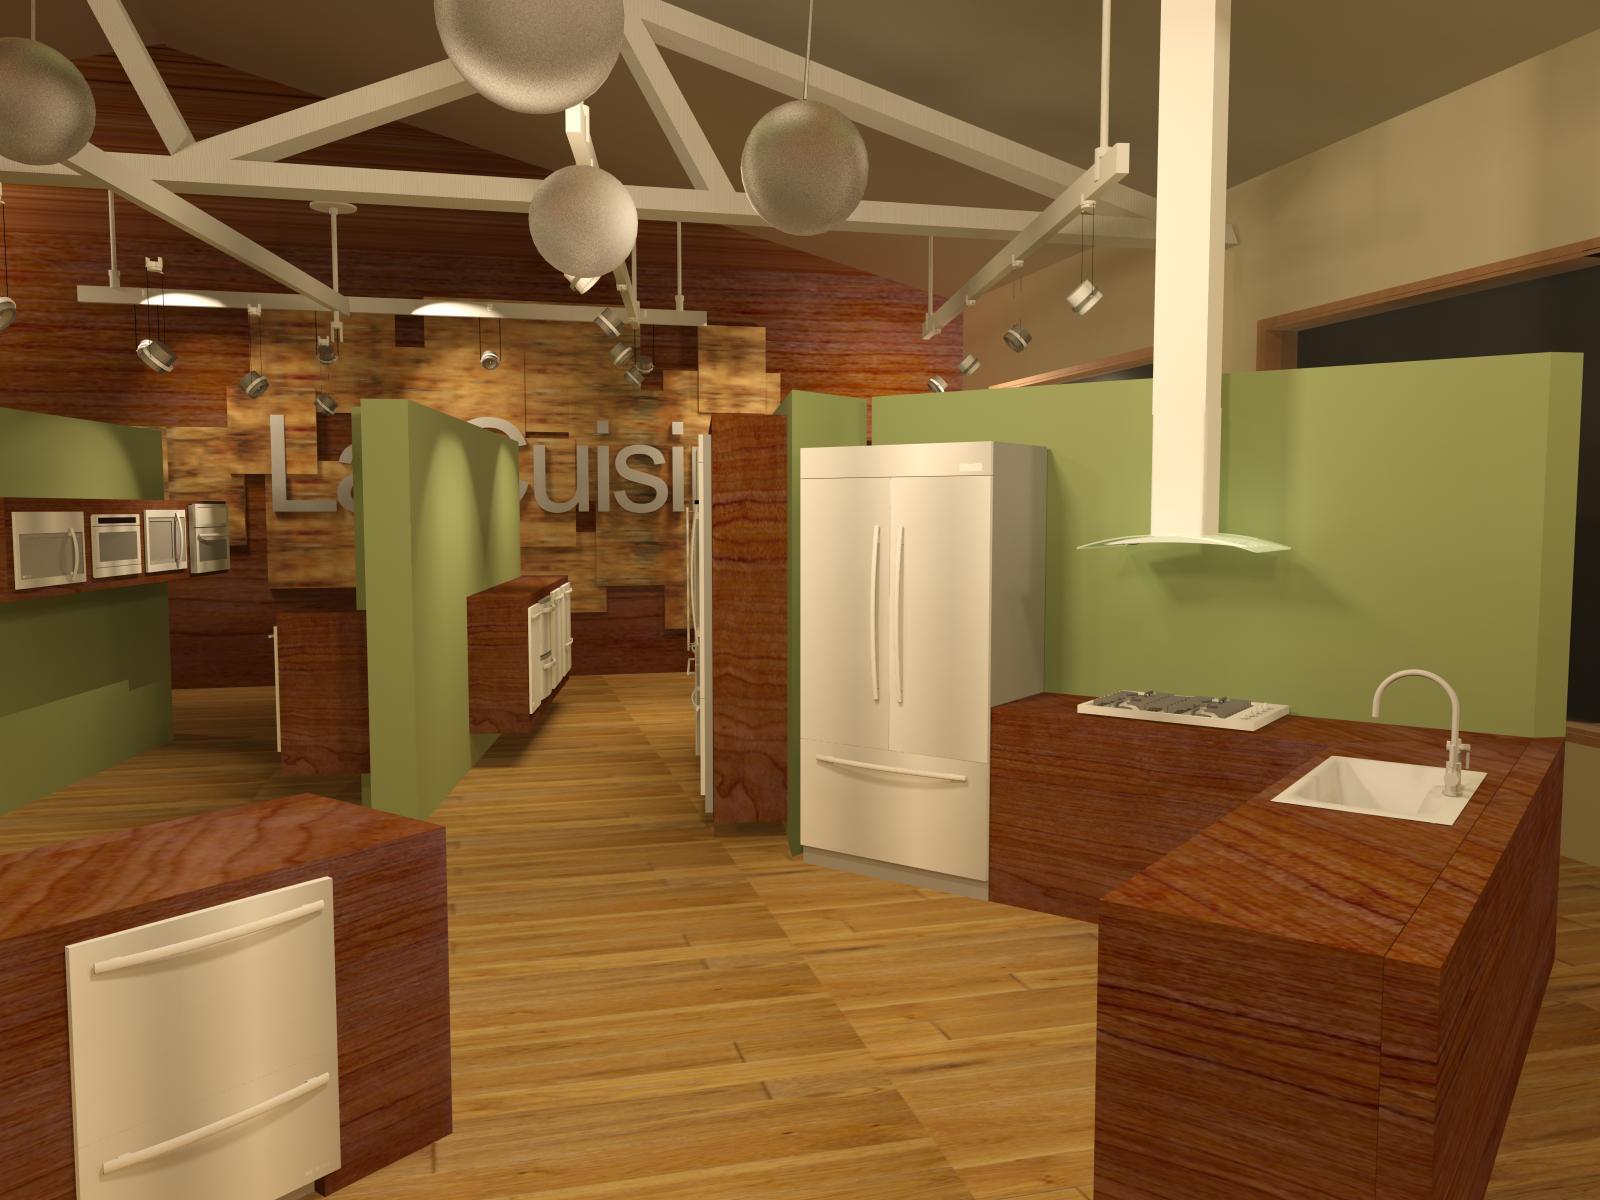 Kitchen appliance store jessica slegowski intr 245 - Kitchen appliances store ...